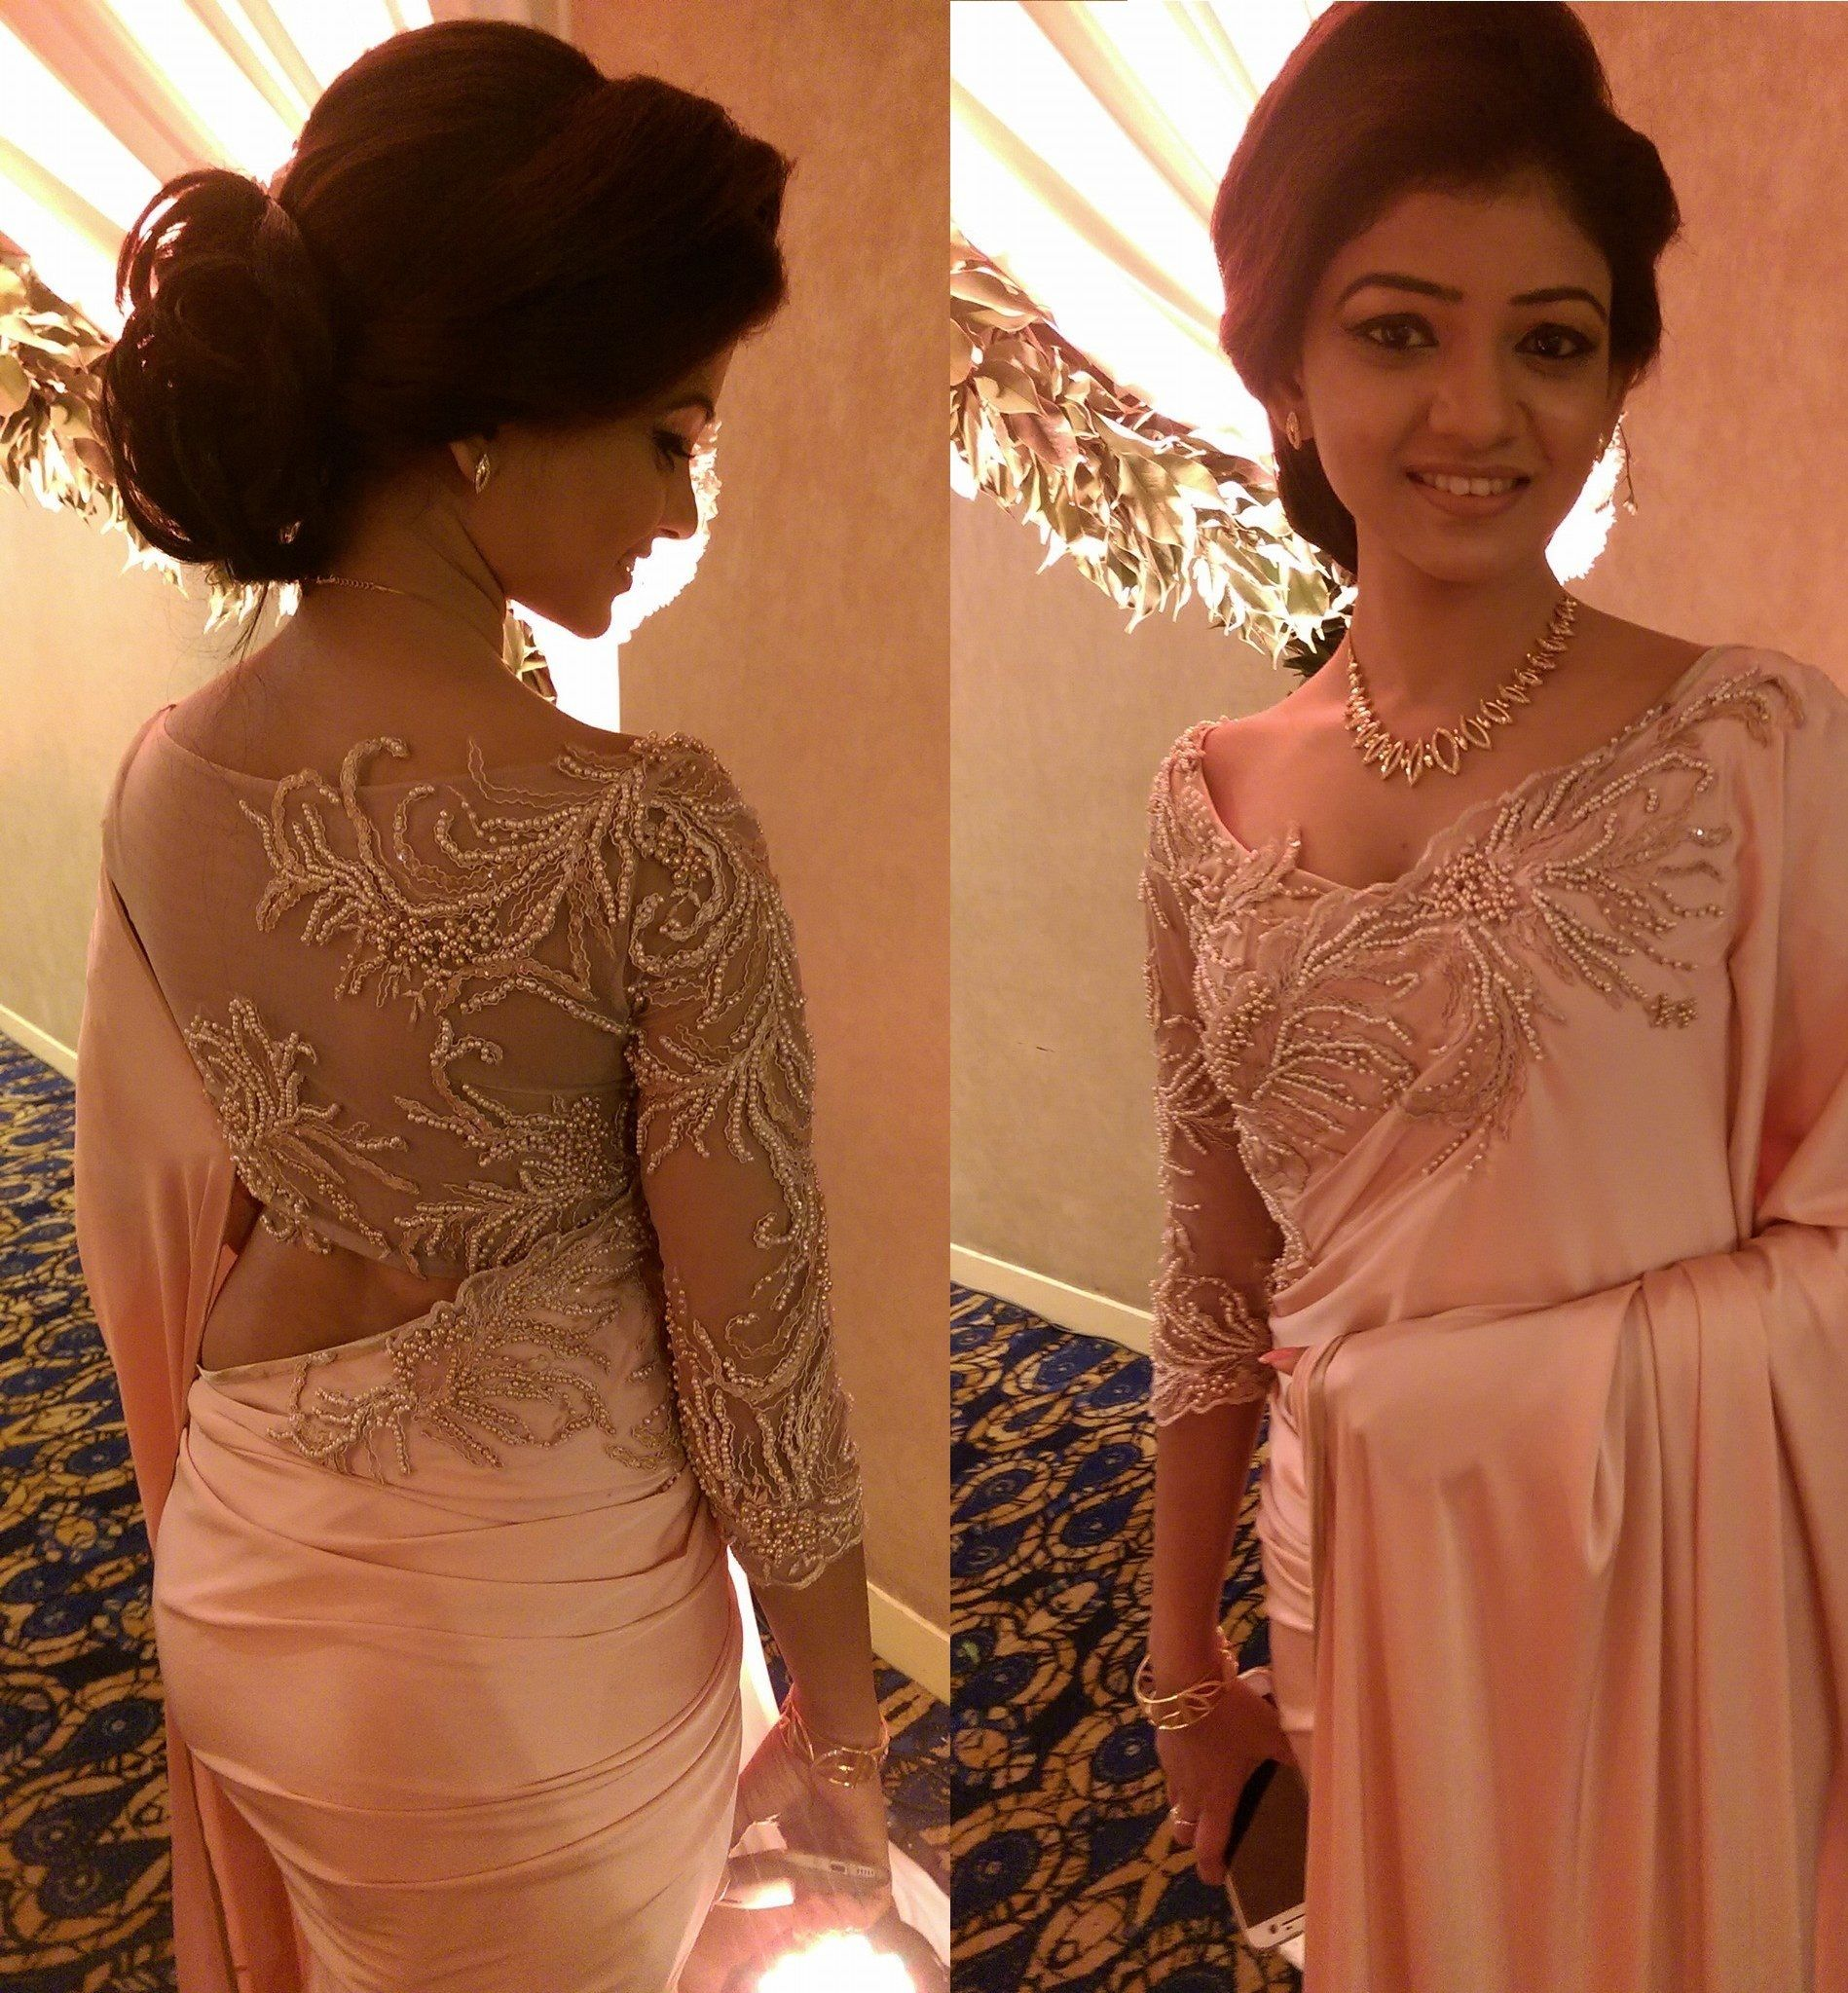 Wedding Hairstyle In Sri Lanka: Sri Lankan Fashion Maya And Anuththara Superfit # 19